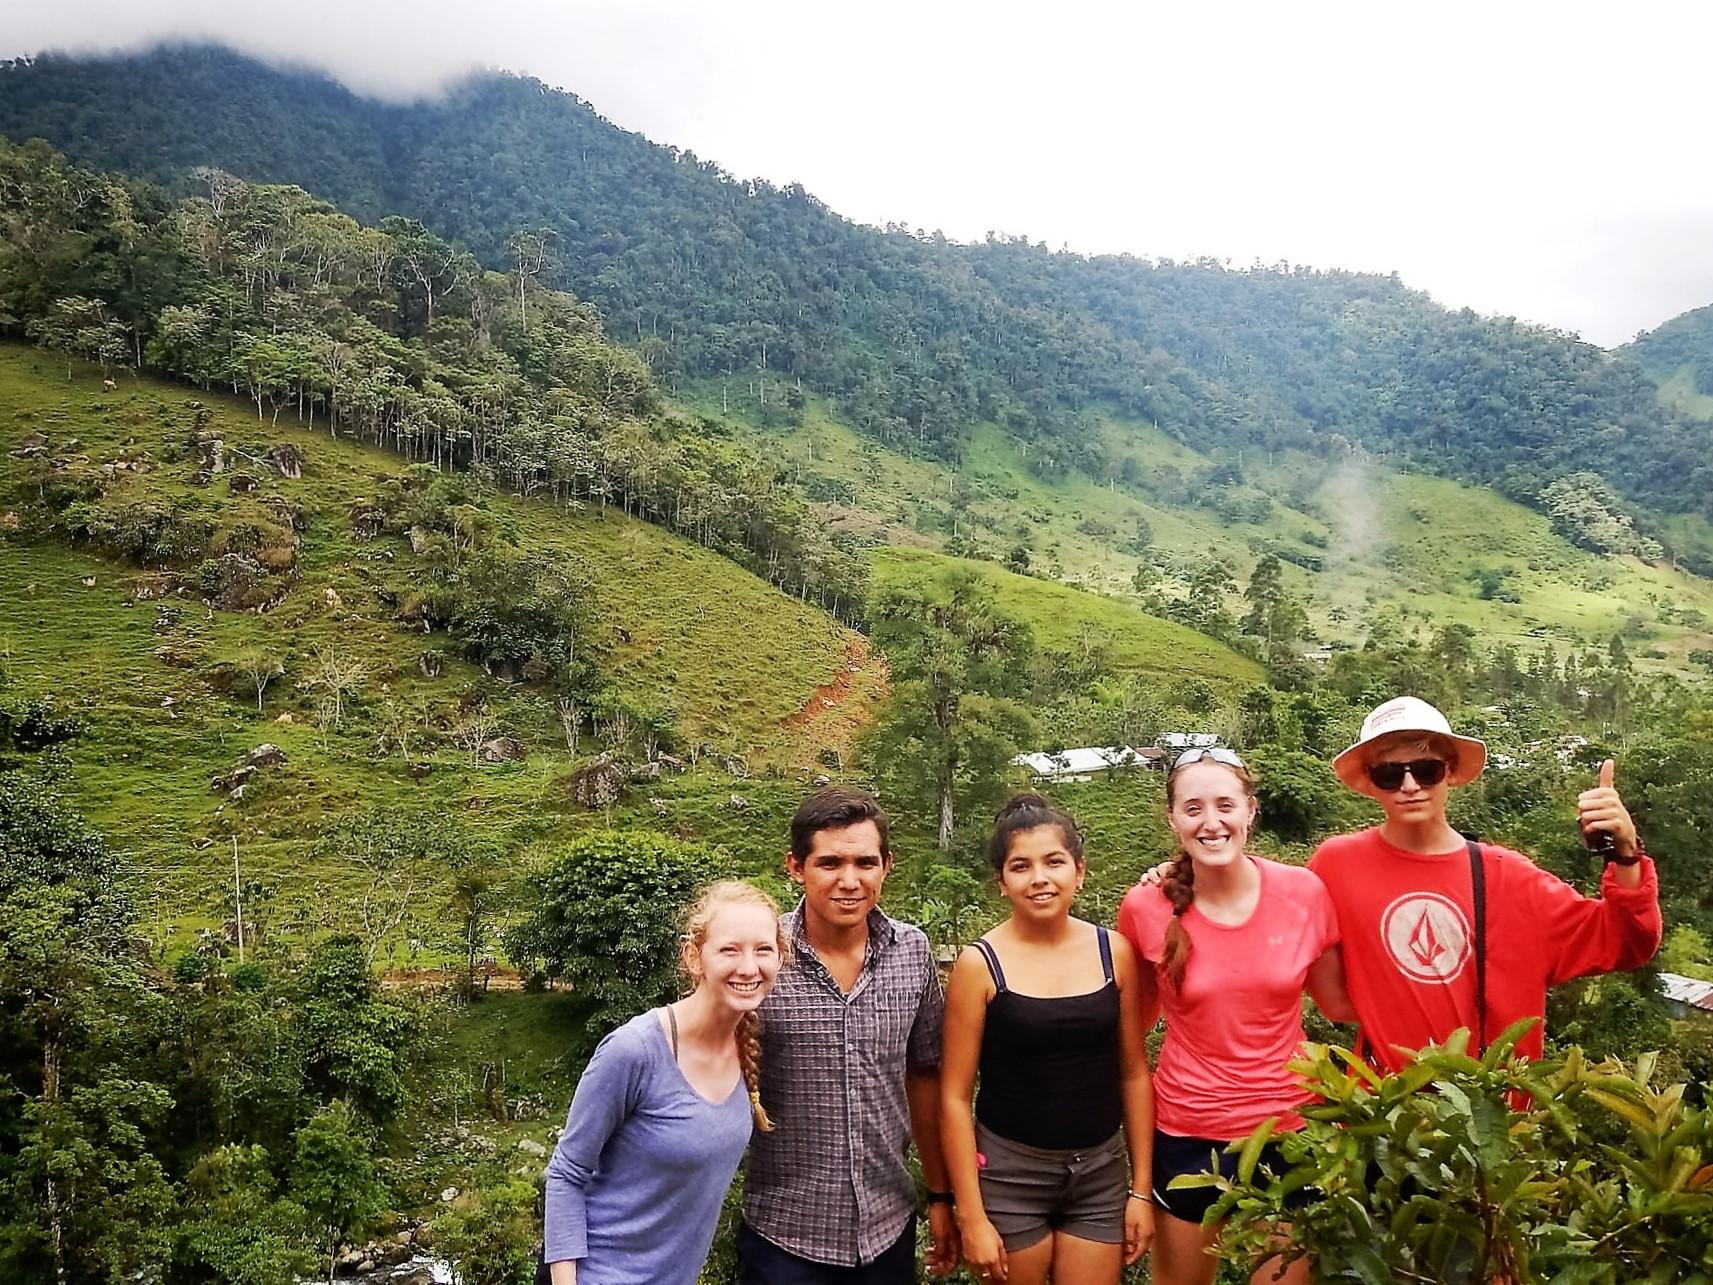 Summer Program - Preserving the Environment | Global Works - Costa Rica: La Pura Vida